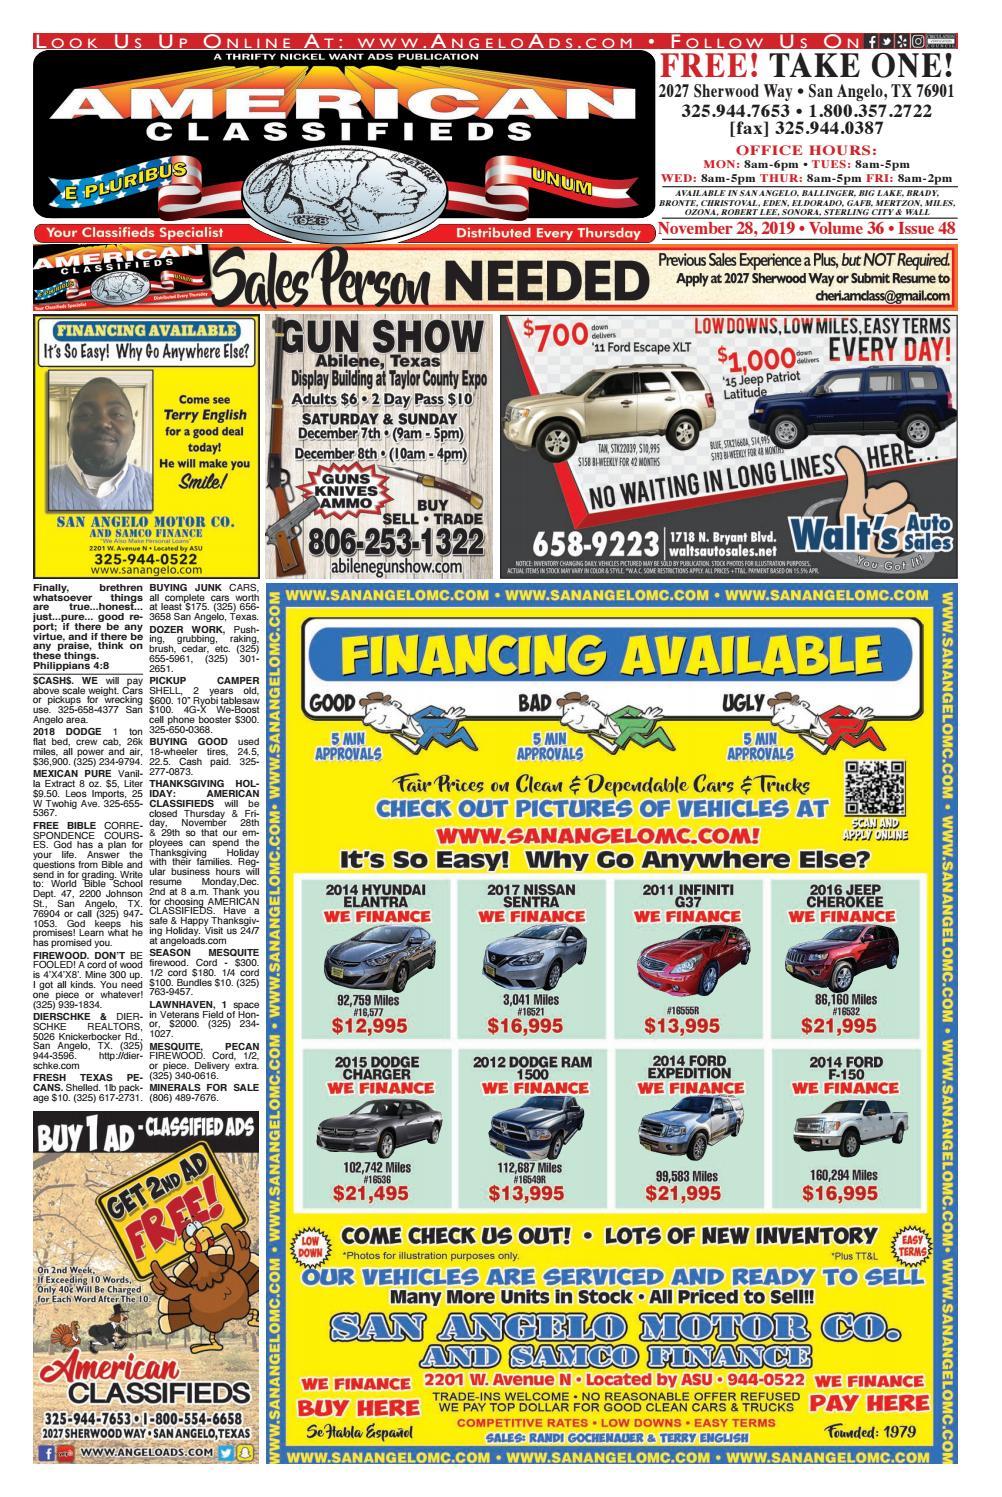 Brand New San Angelo Heavy Duty Wildlife Feeder Utility Hoist w// 4:1 Lift Ratio